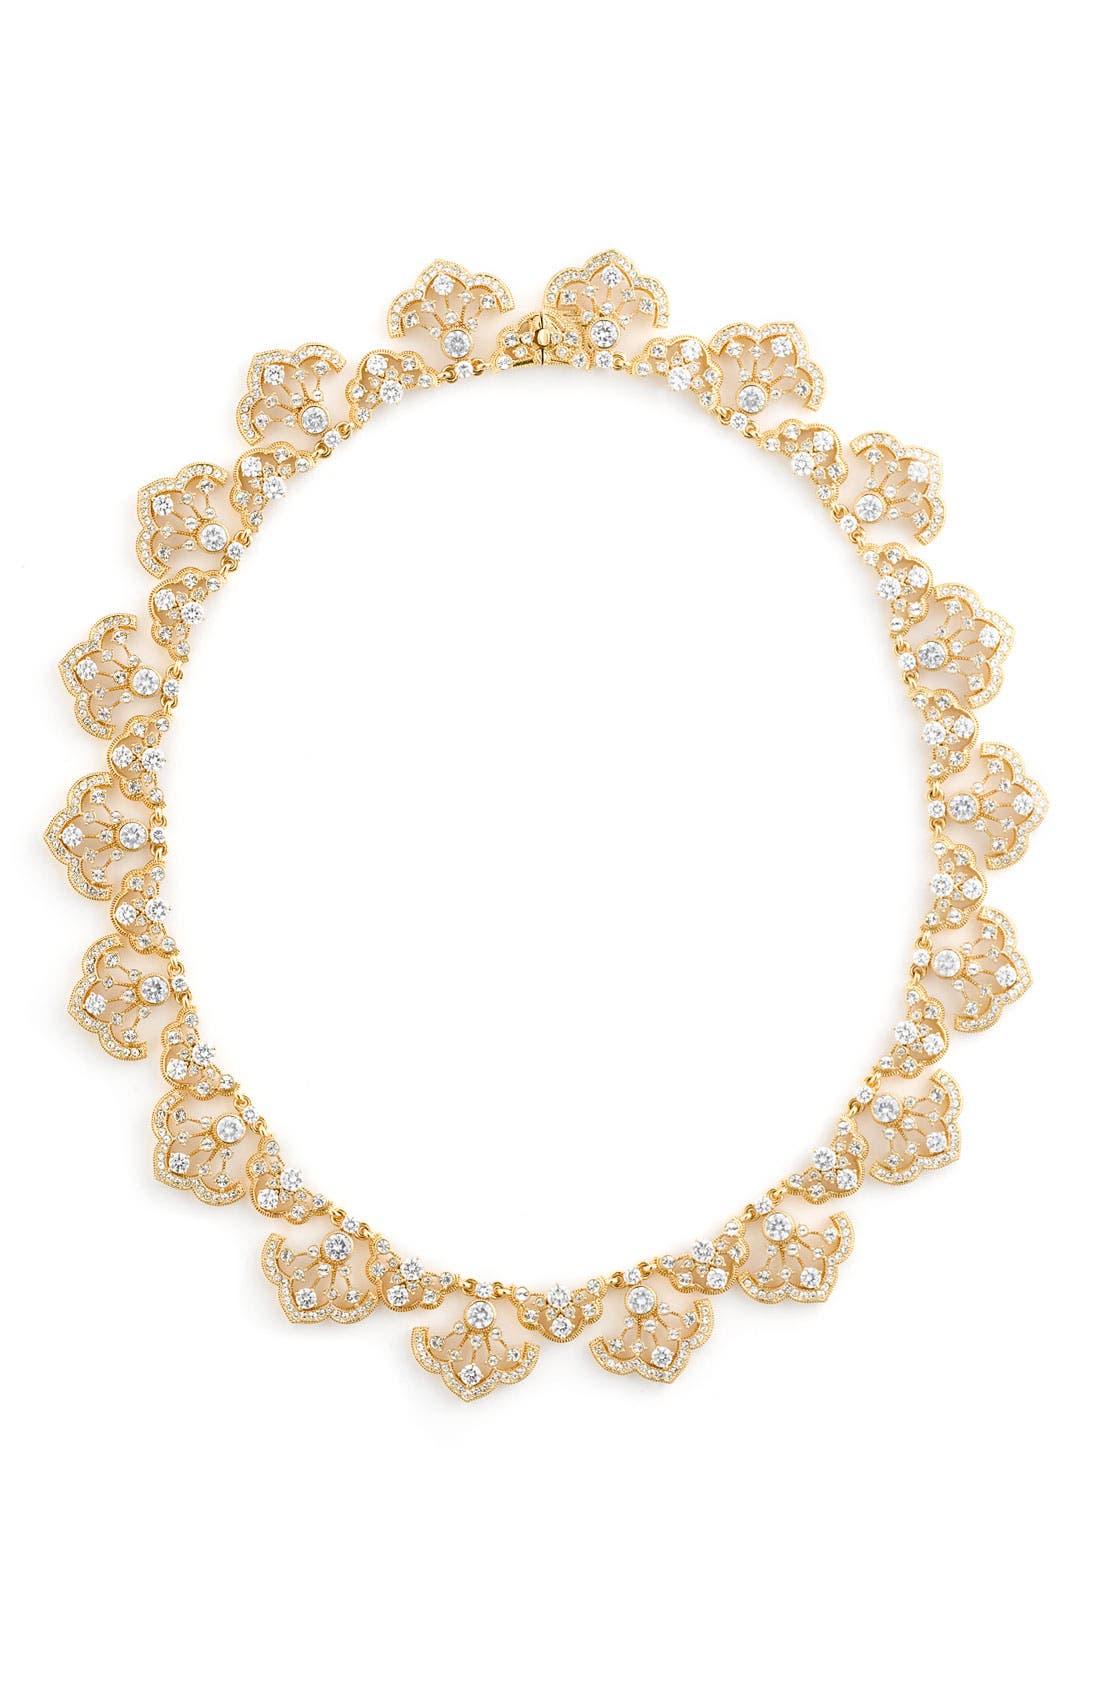 Main Image - Nadri Scalloped Crystal Necklace